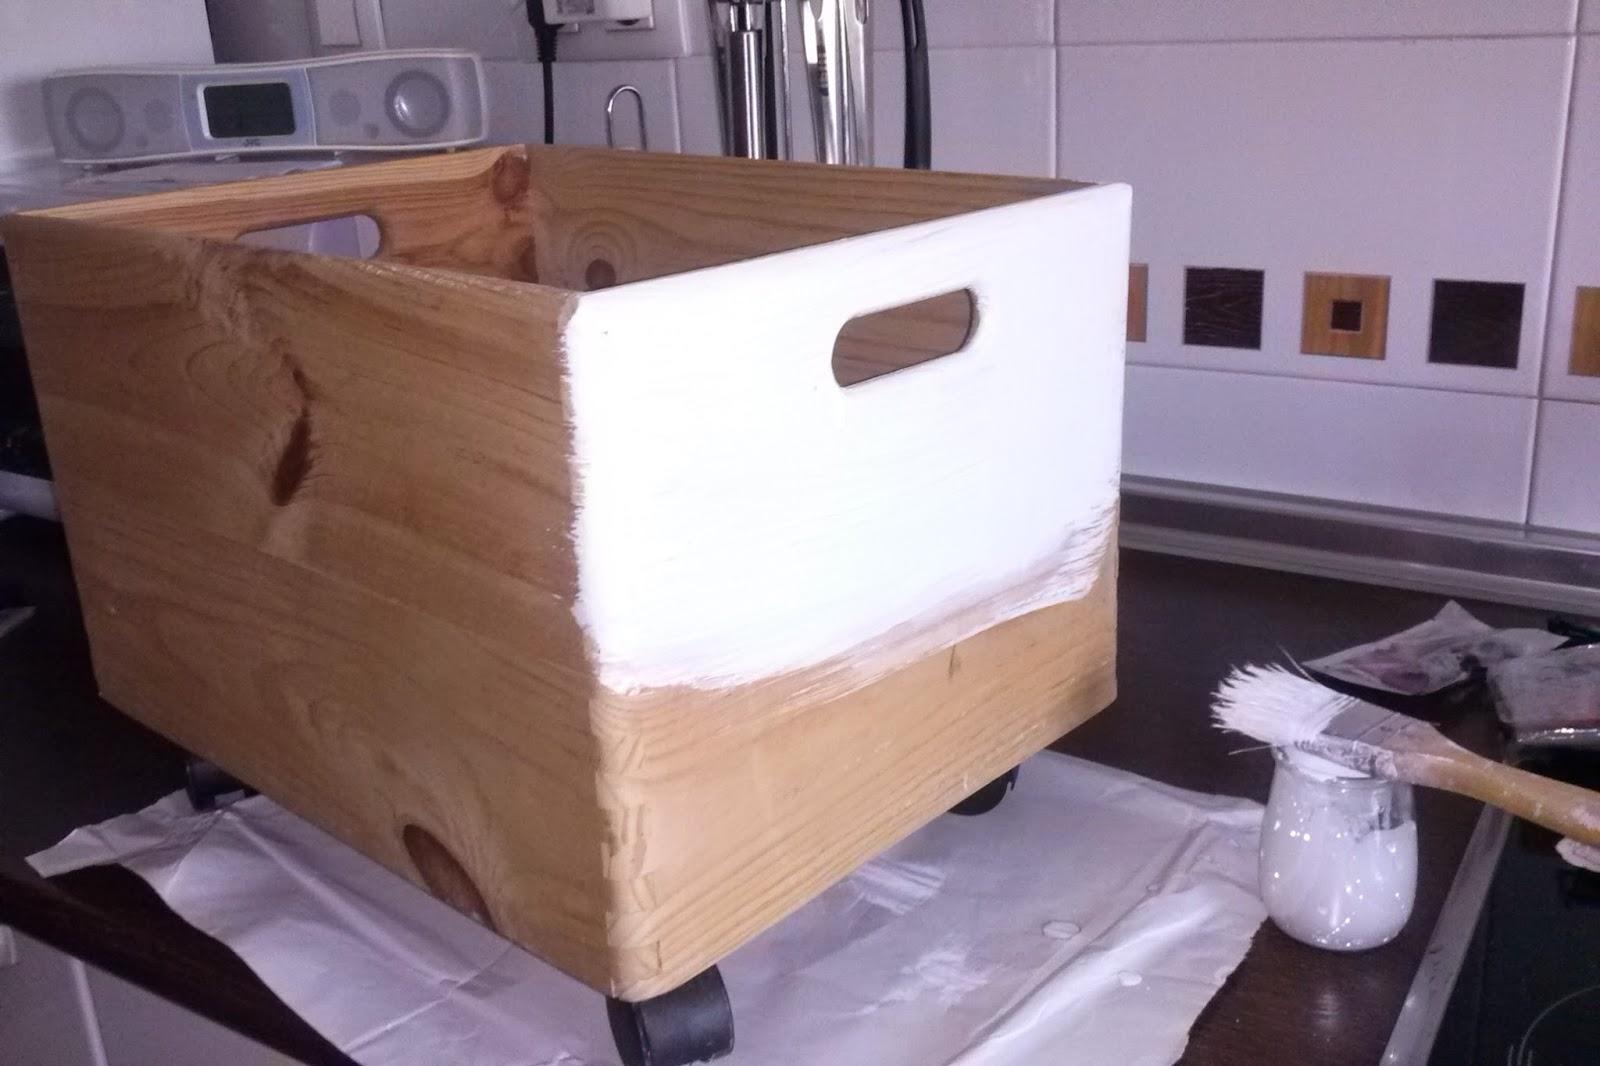 Mueble de madera decorado con decoupagge kosicas de fieltro for Decoupage con servilletas en muebles